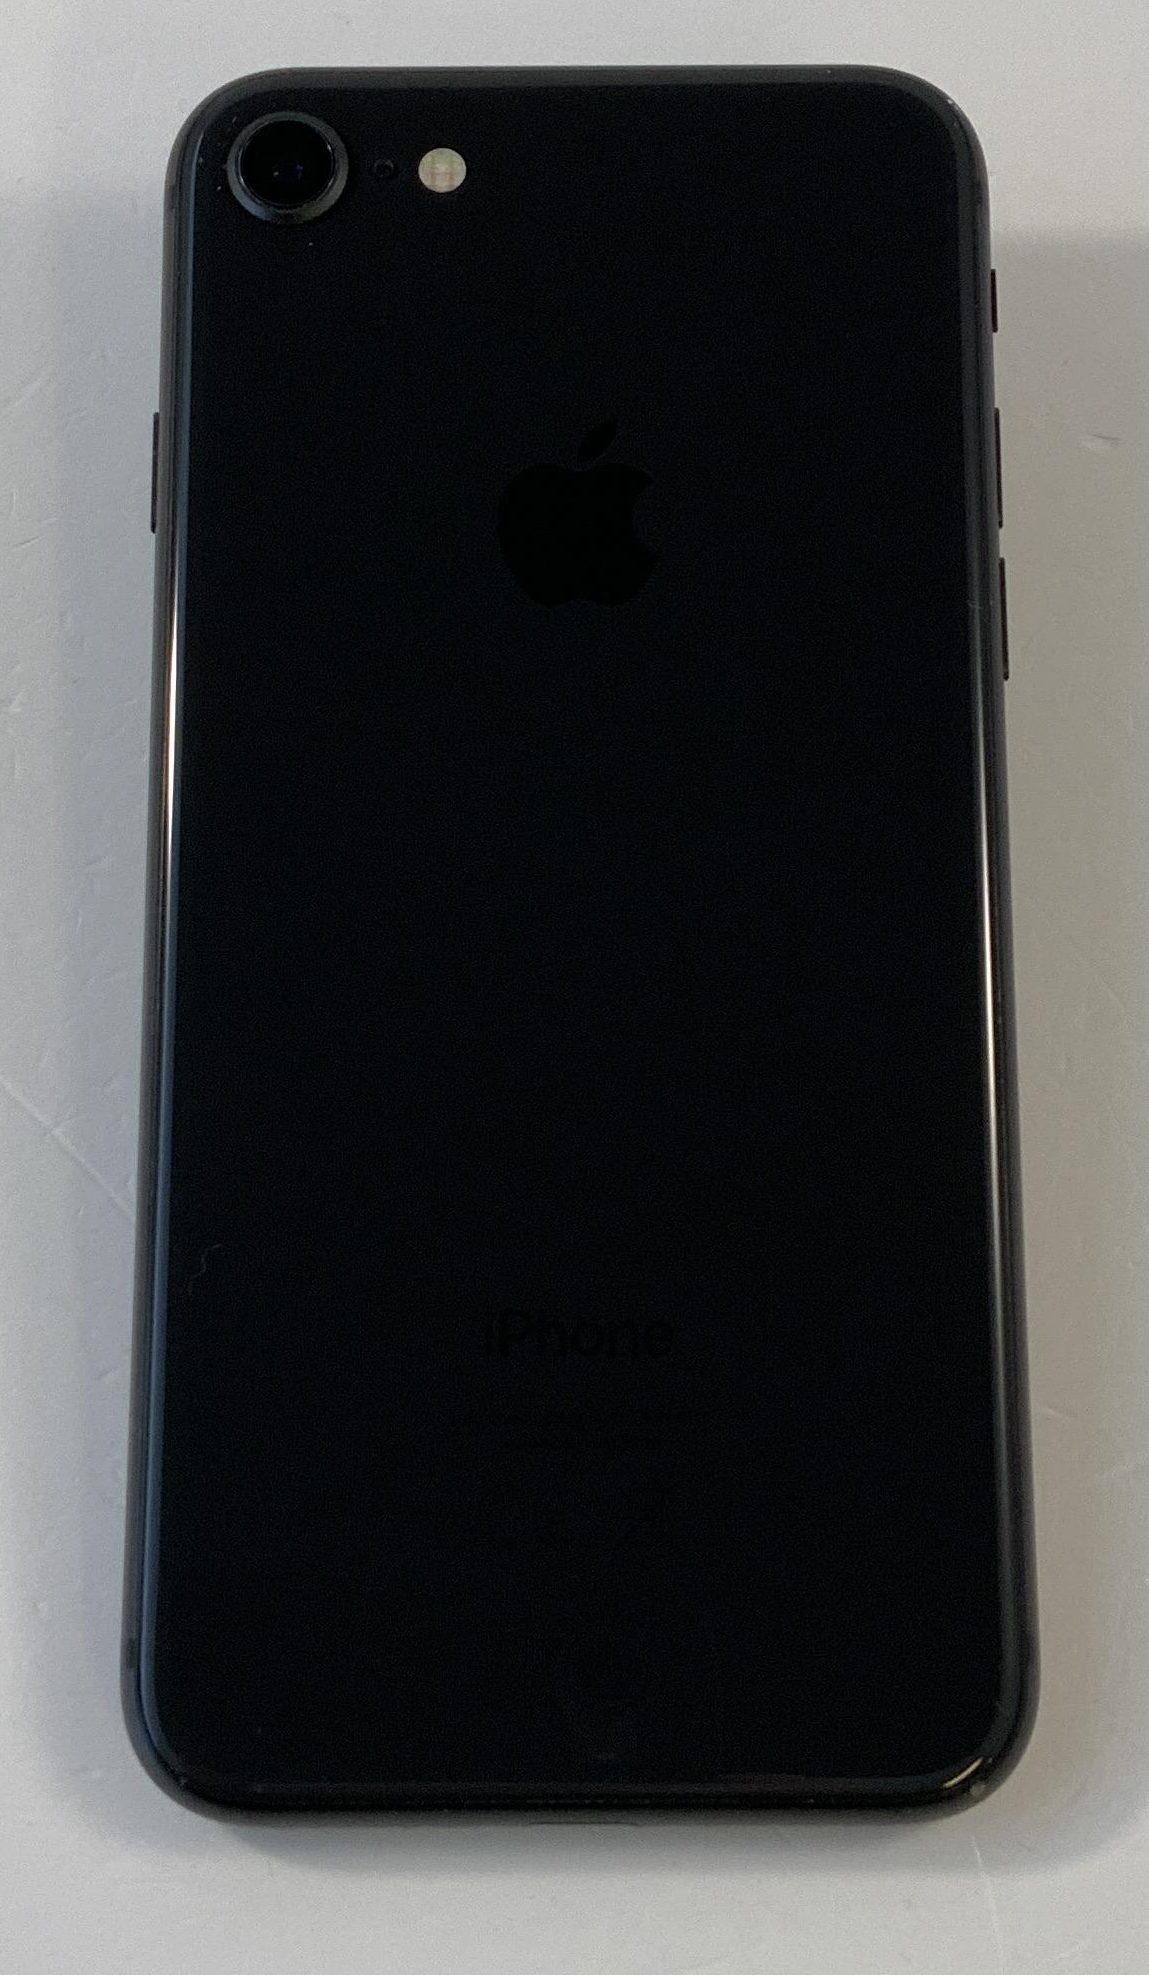 iPhone 8 64GB, 64GB, Space Gray, image 2